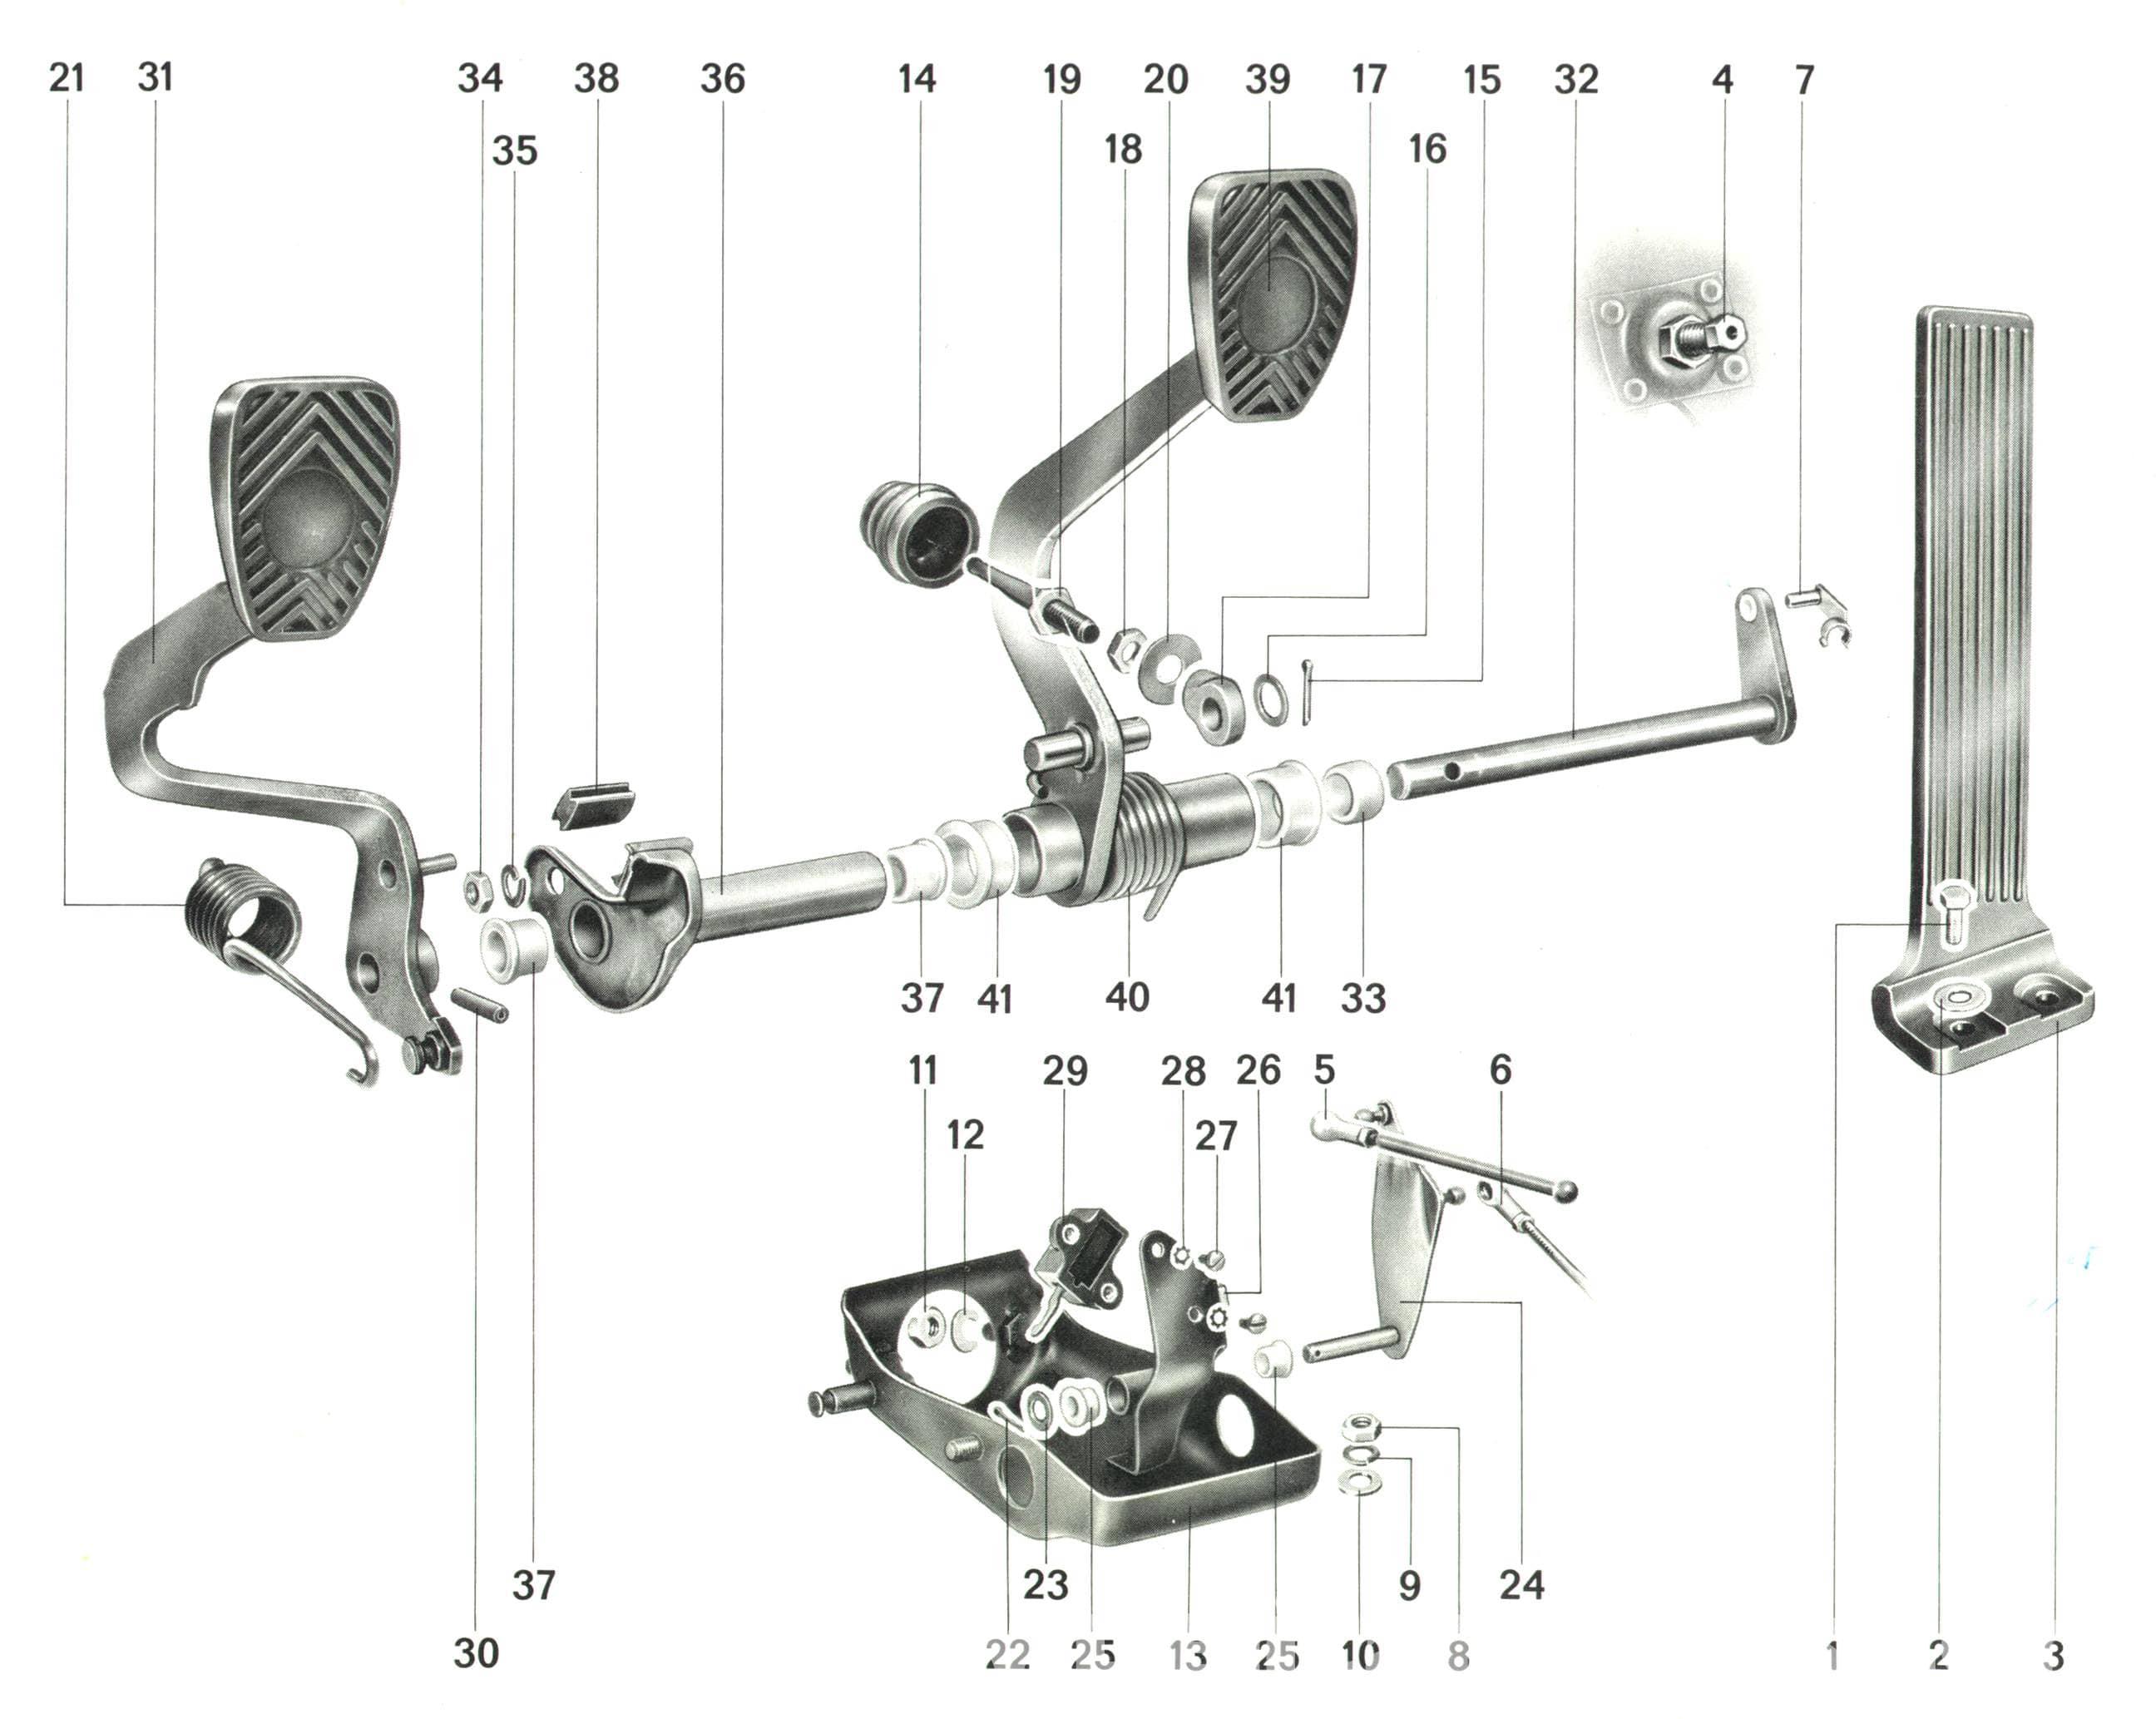 porsche 911 engine diagram of parts hpm exhaust fan wiring pedal cluster rebuild 1965 89 930